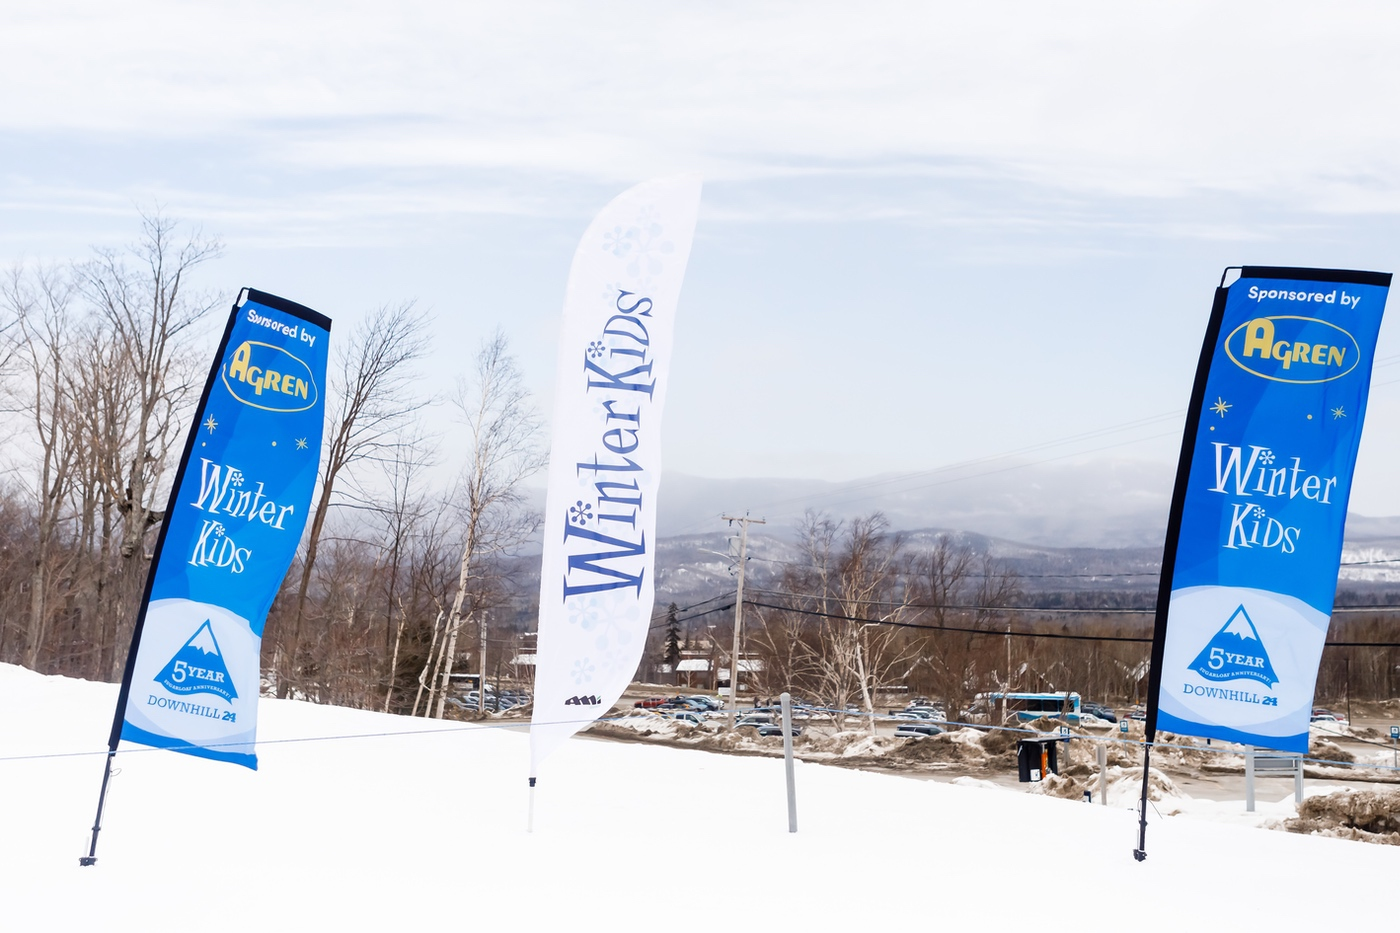 WinterKids Downhill 24 2021 SDP 2849